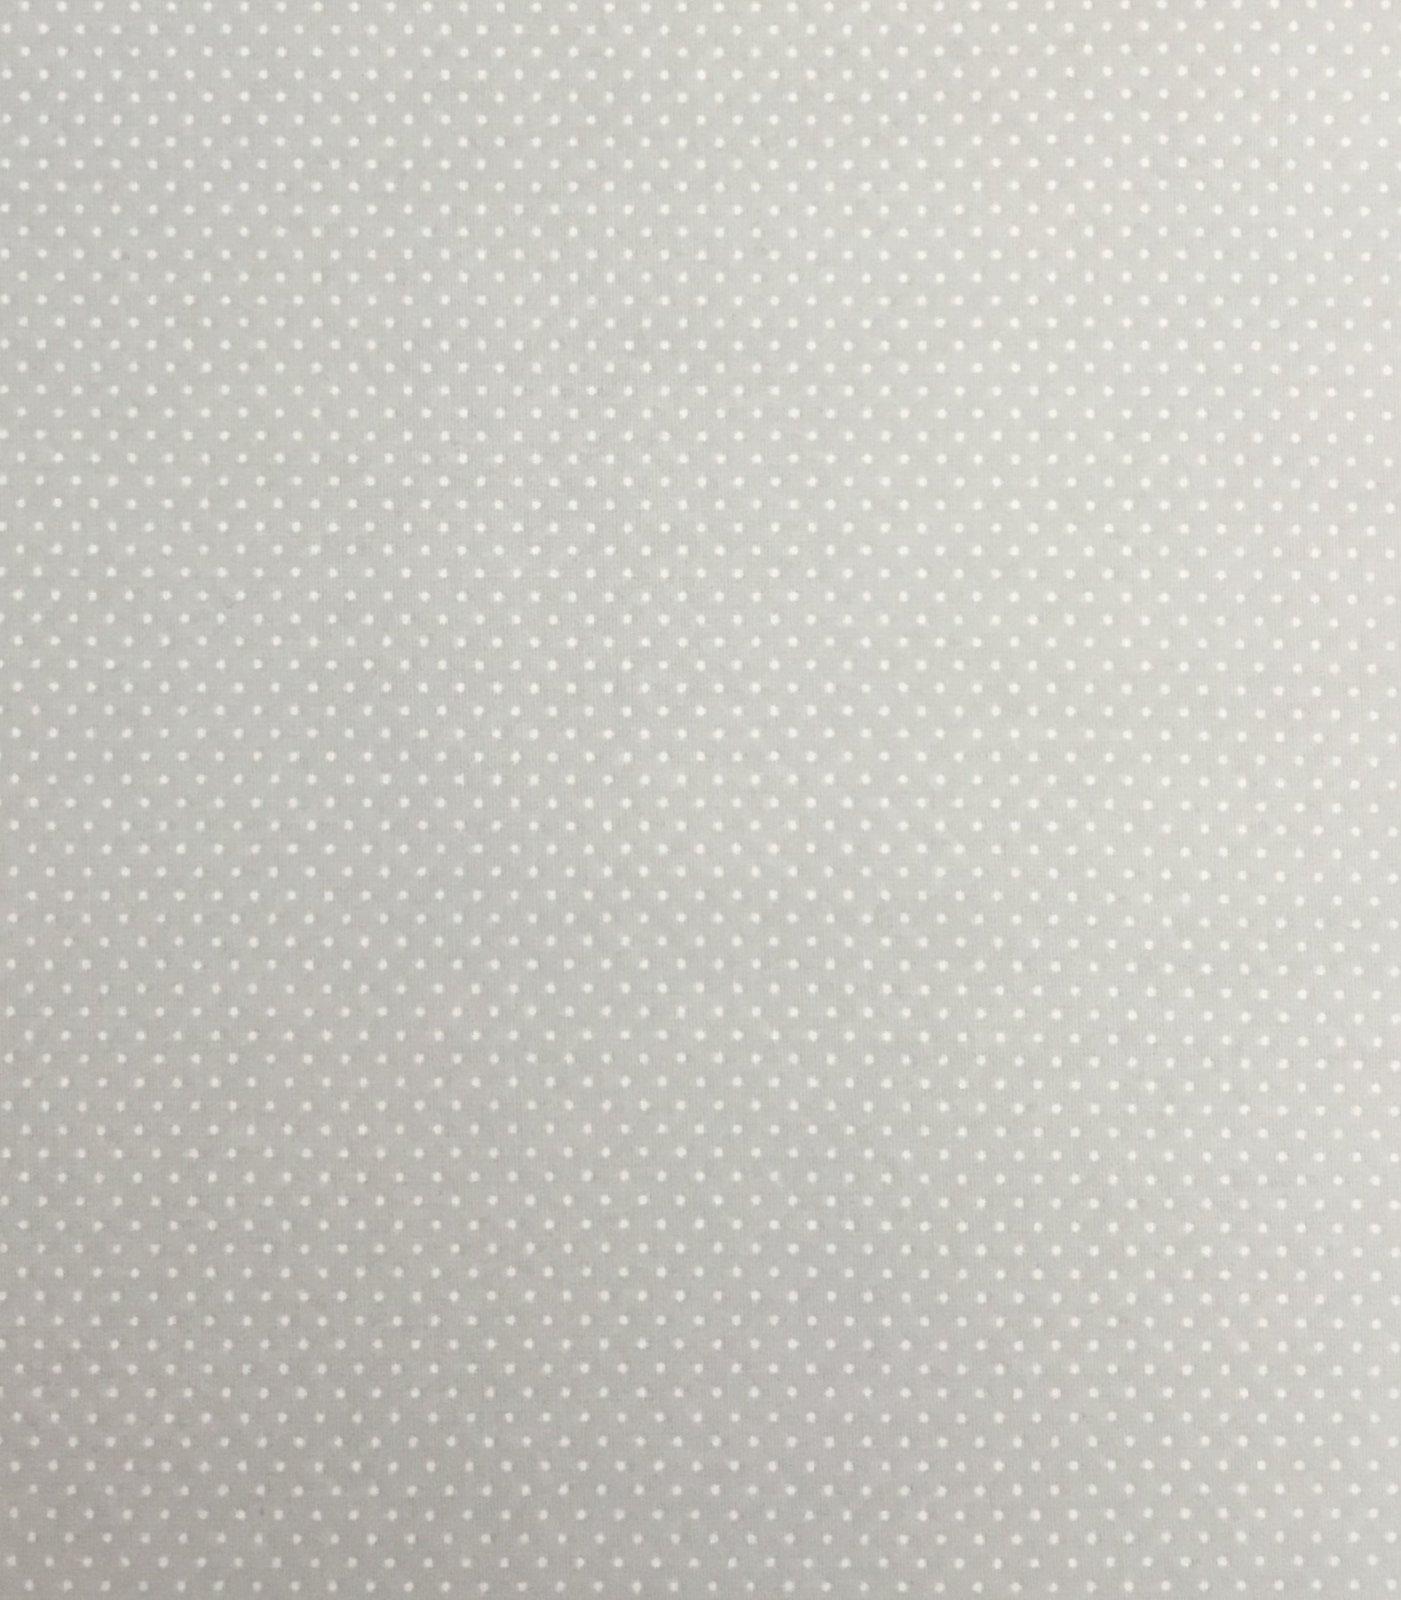 Adaman Coast - Silver Linings - White Microdot on Silver